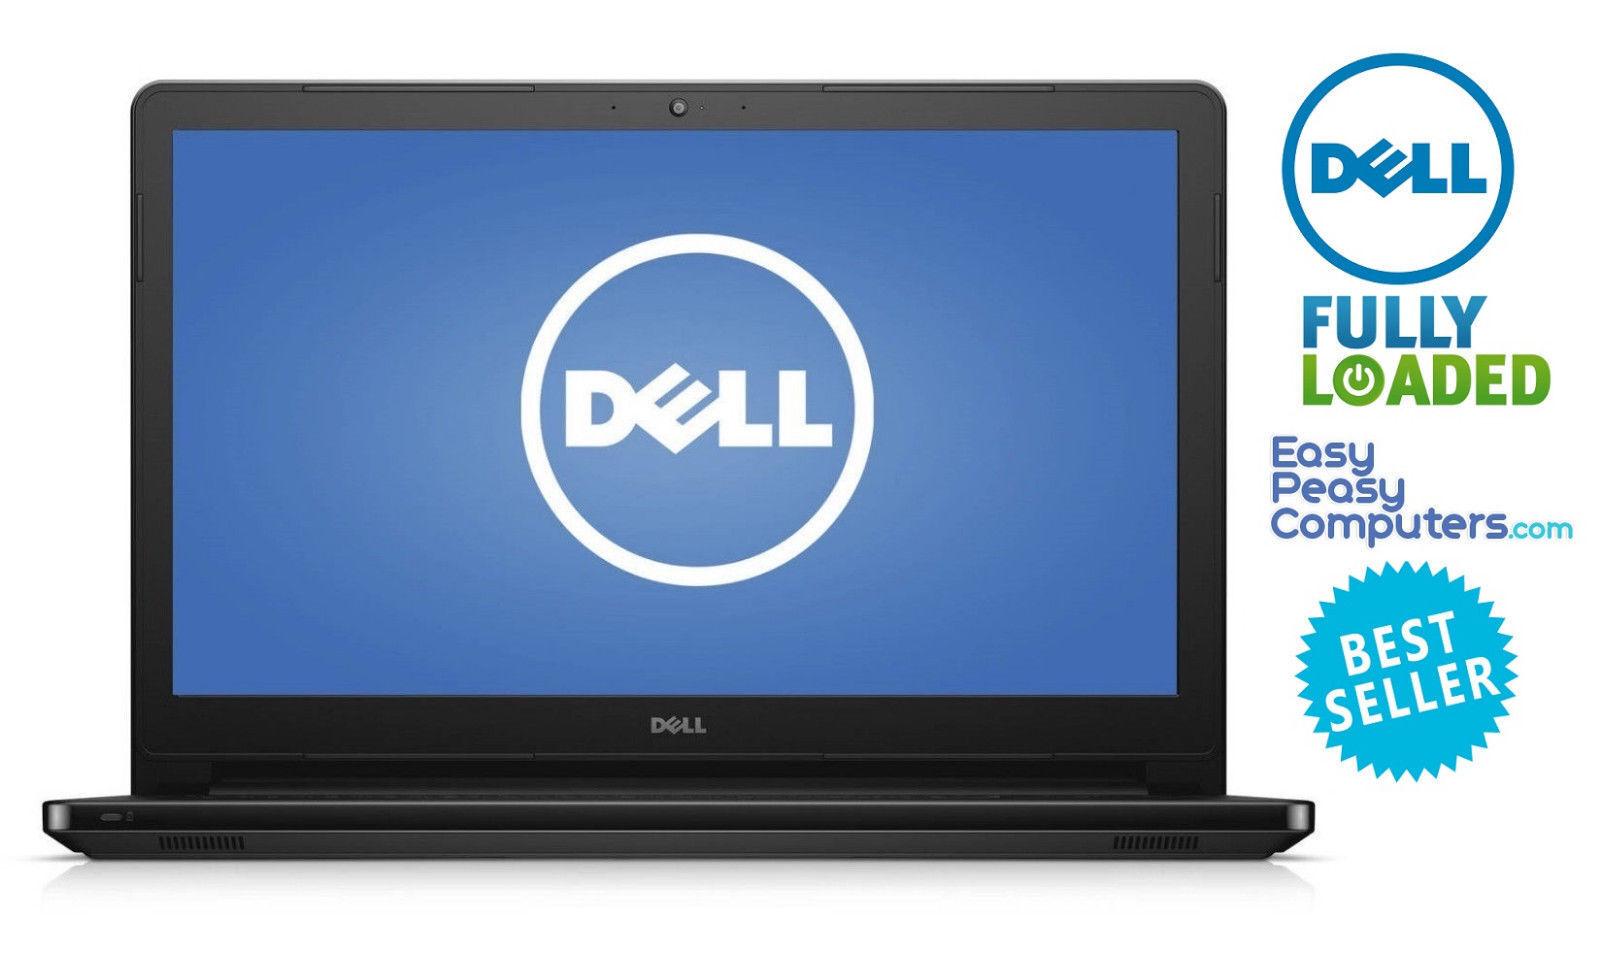 "Dell Laptop Touchscreen 15.6"" WIN10 8GB 1TB Bluetooth WiFi W"